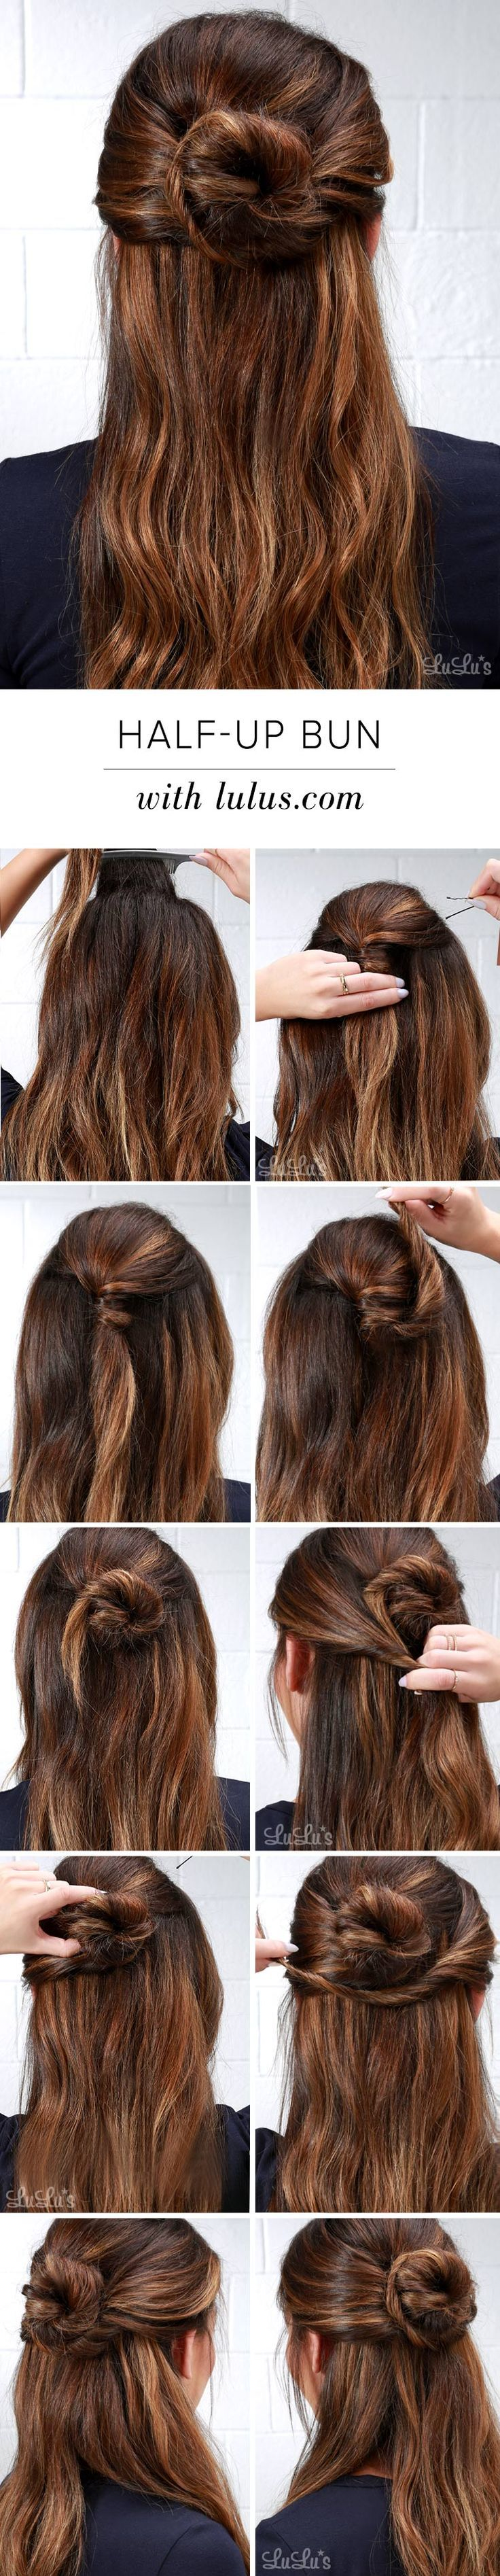 nice LuLu*s How-To: Half-Up Bun Hair Tutorial by http://www.top10-haircuts.space/hair-tutorials/lulus-how-to-half-up-bun-hair-tutorial/